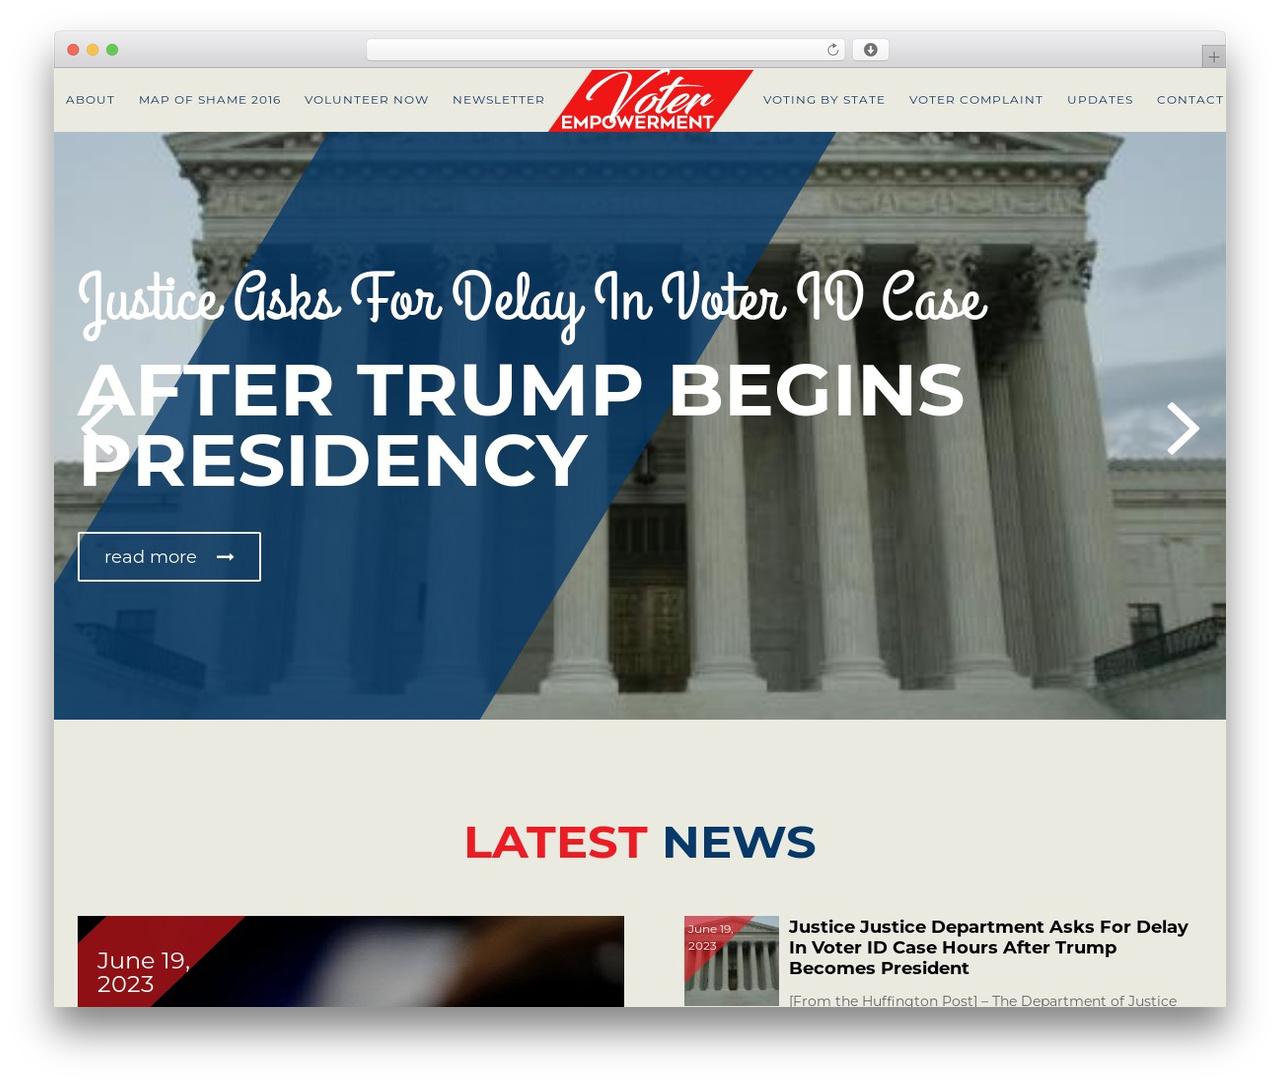 Theme WordPress Politist - 4votingrights.com